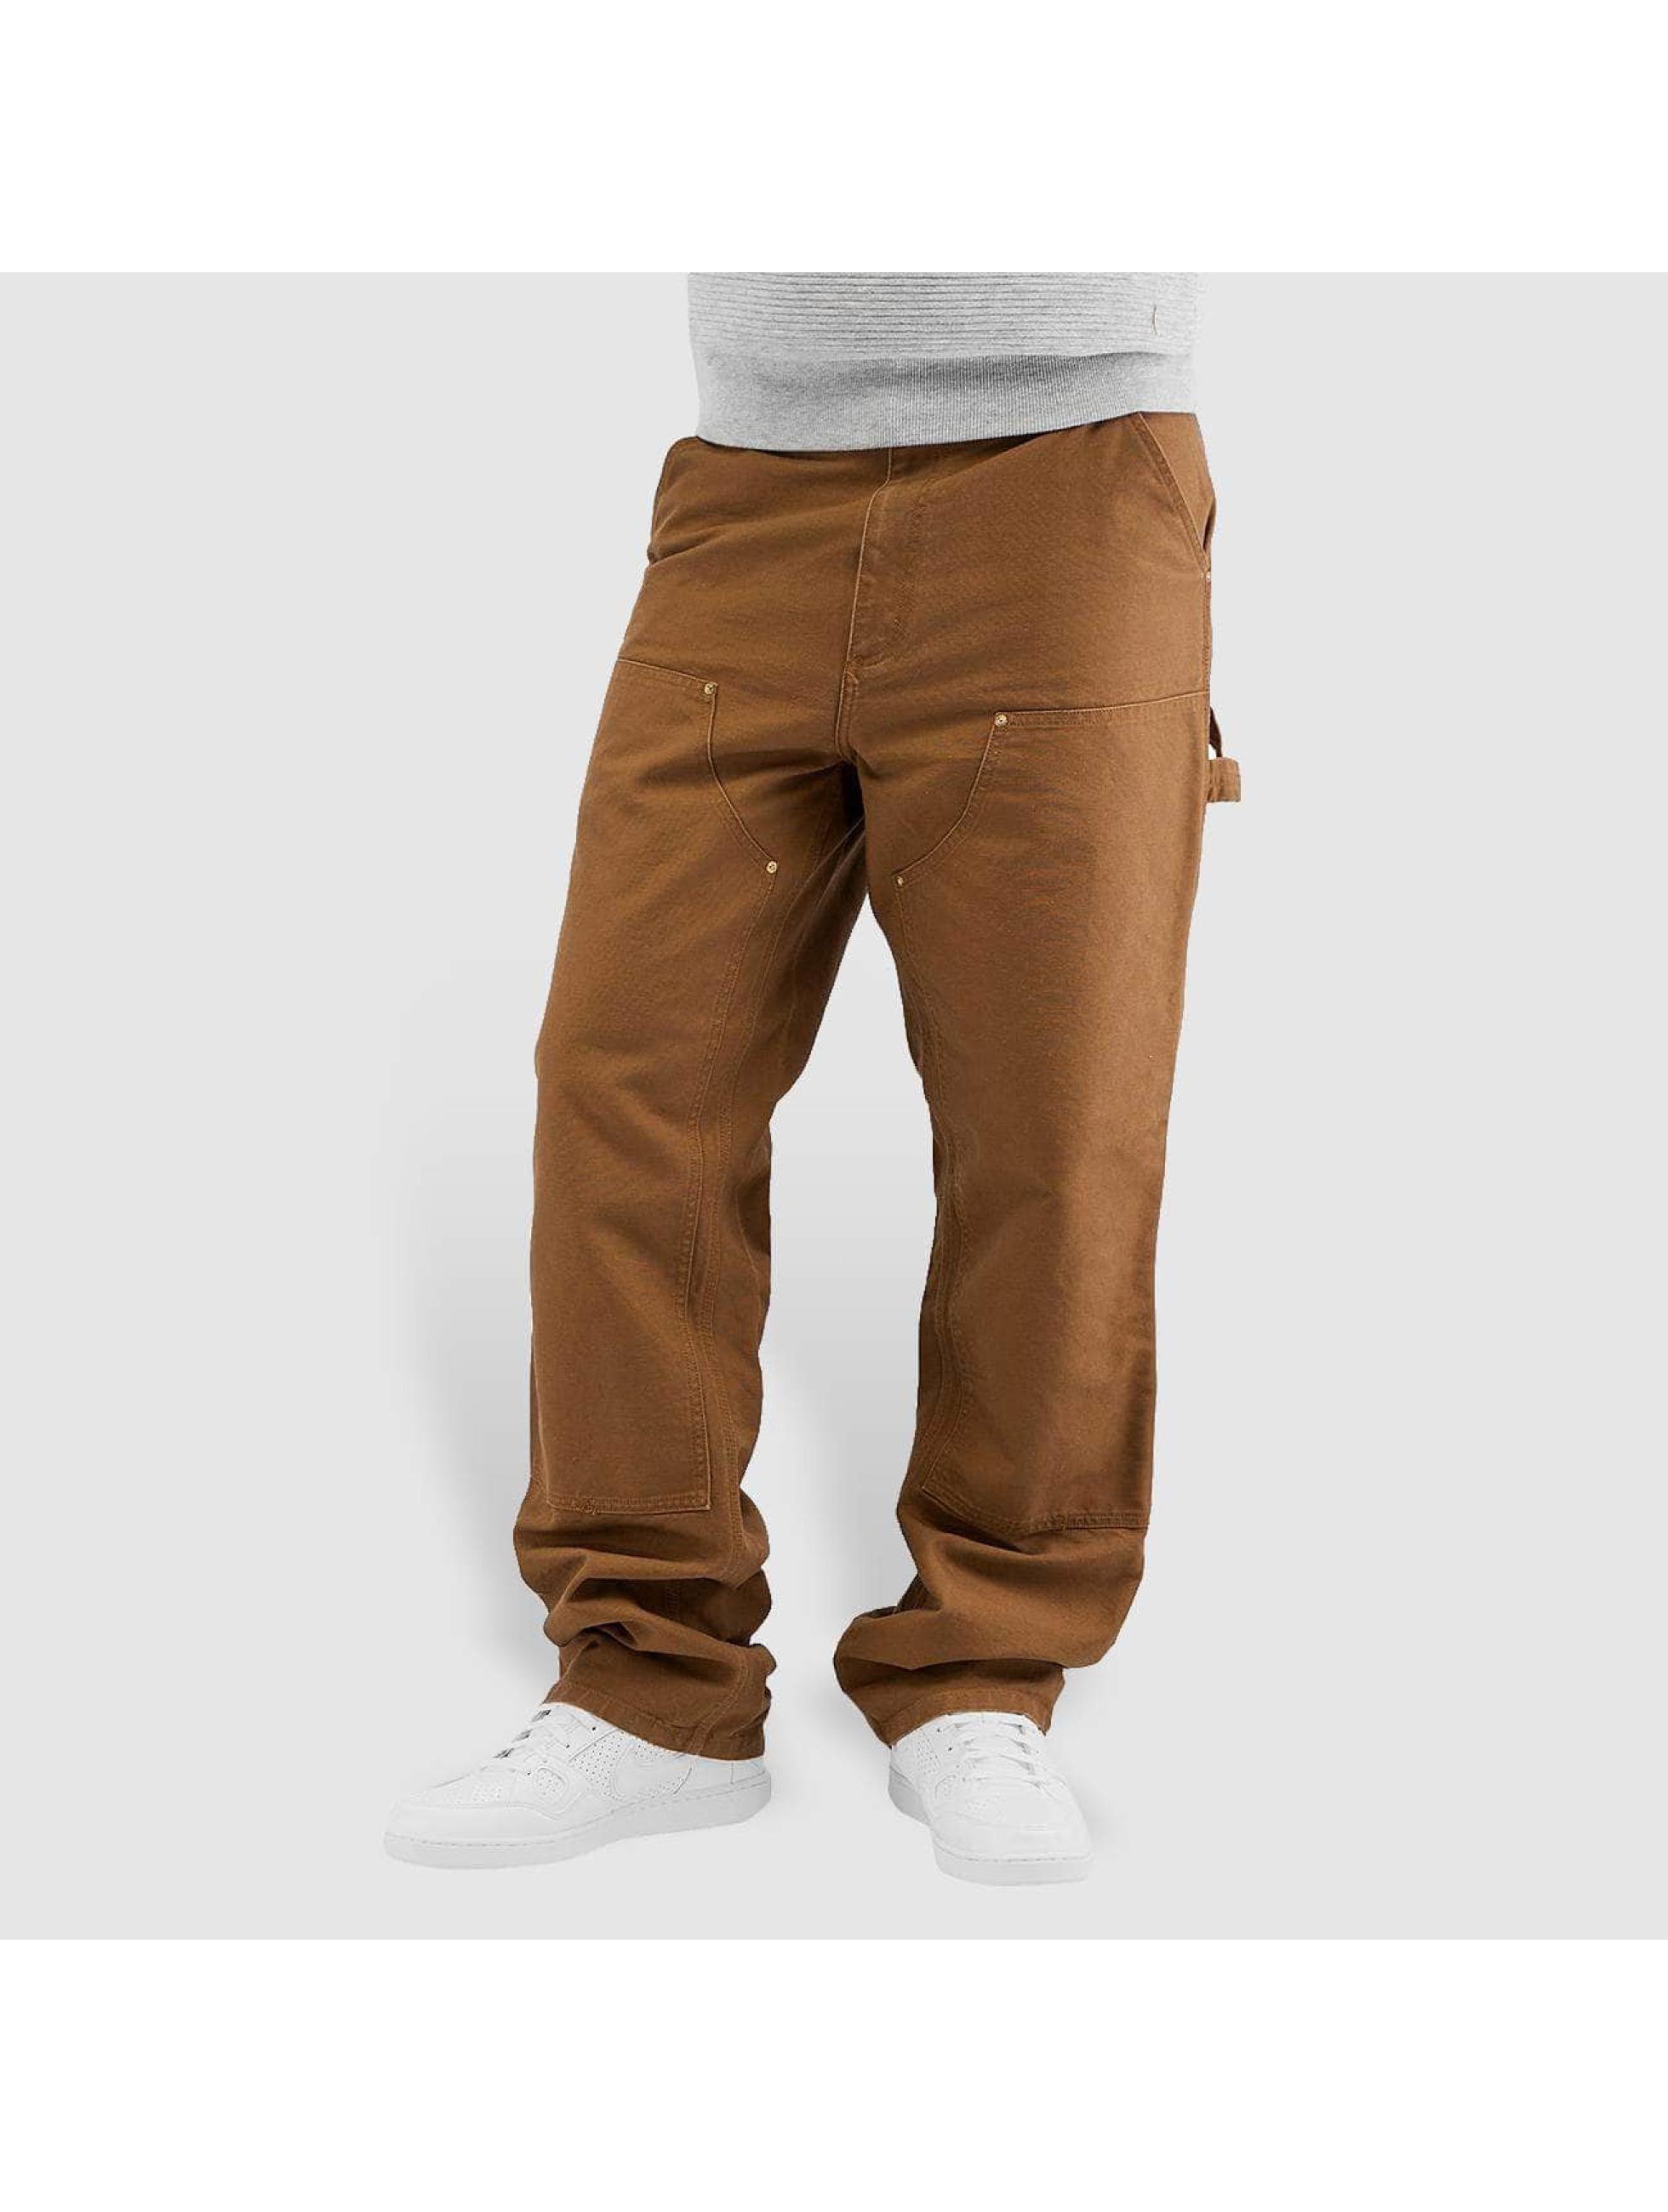 Carhartt WIP Джинсы прямого покроя Turner Double Knee коричневый